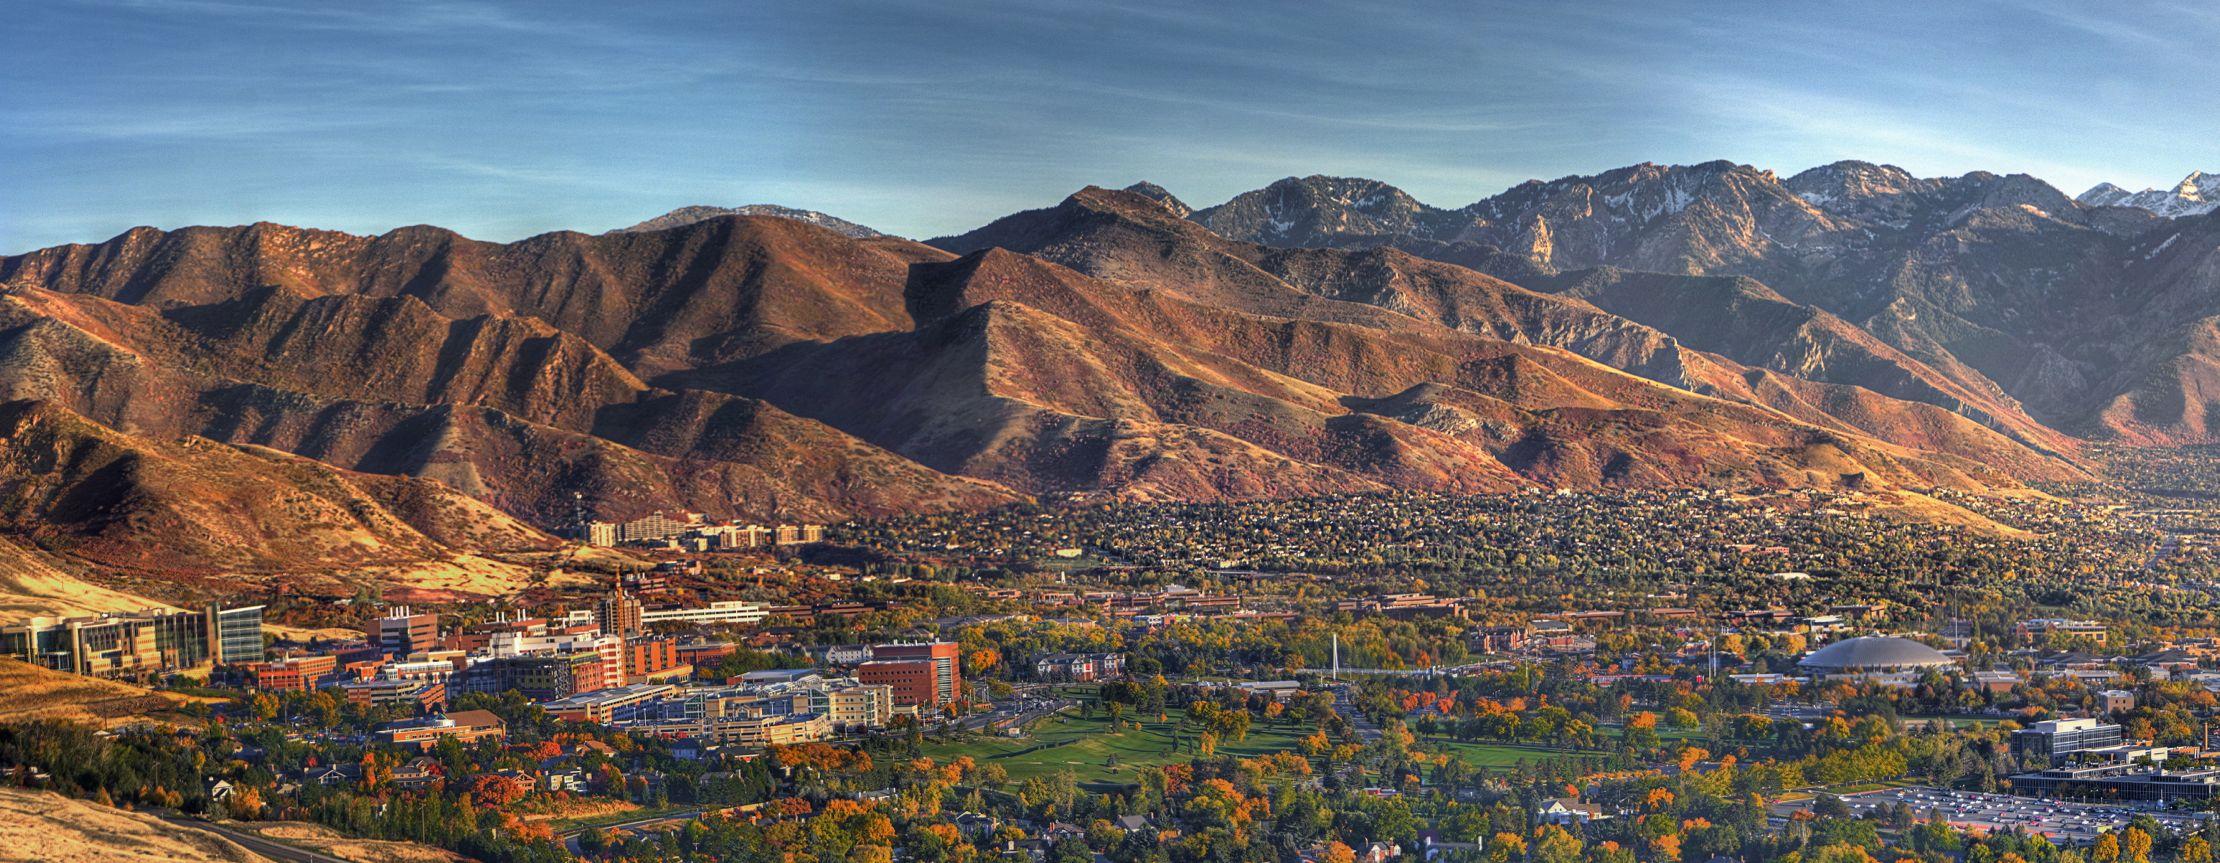 Flux Research Group School Of Computing University Of Utah